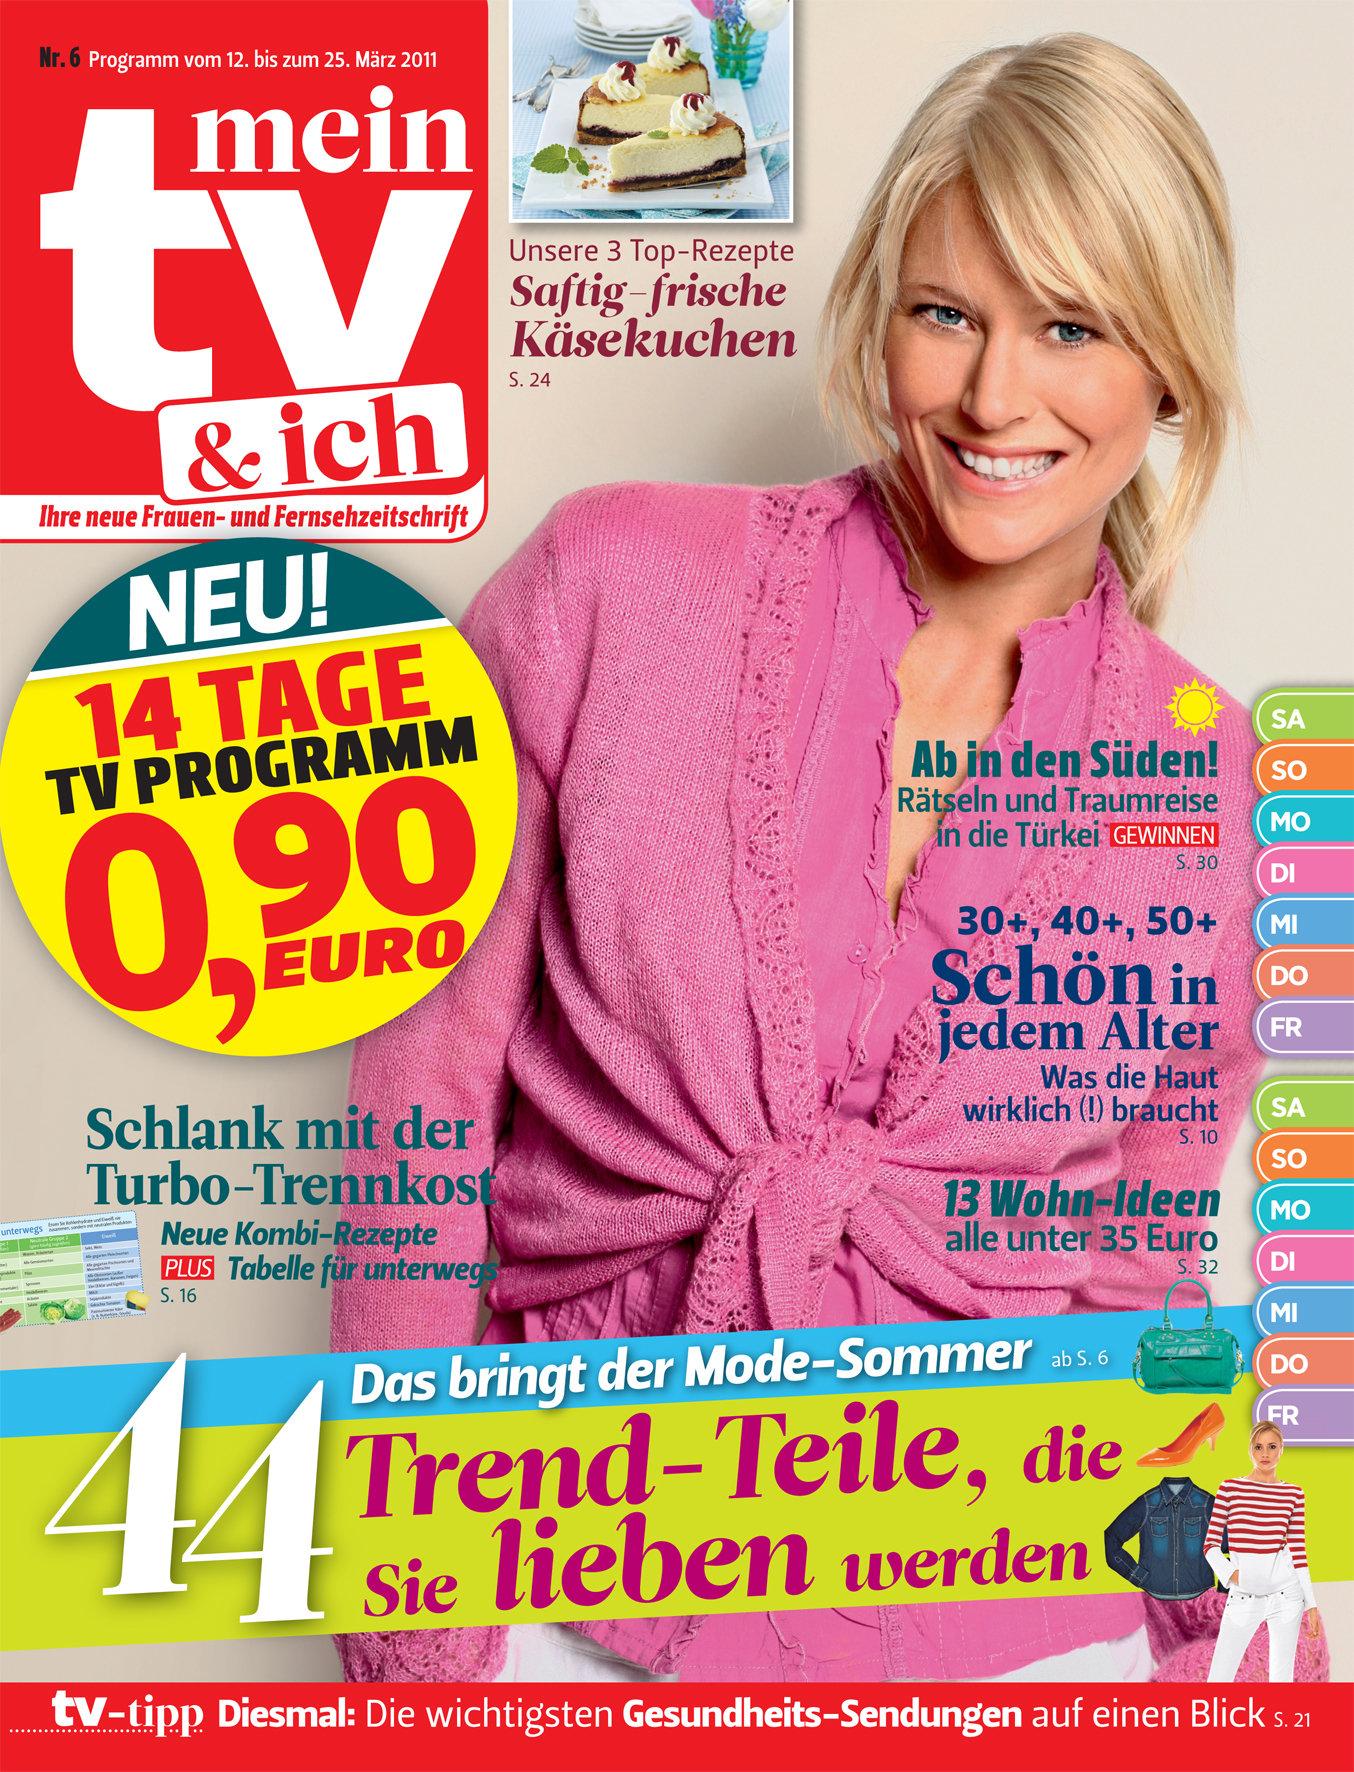 tv14 programm